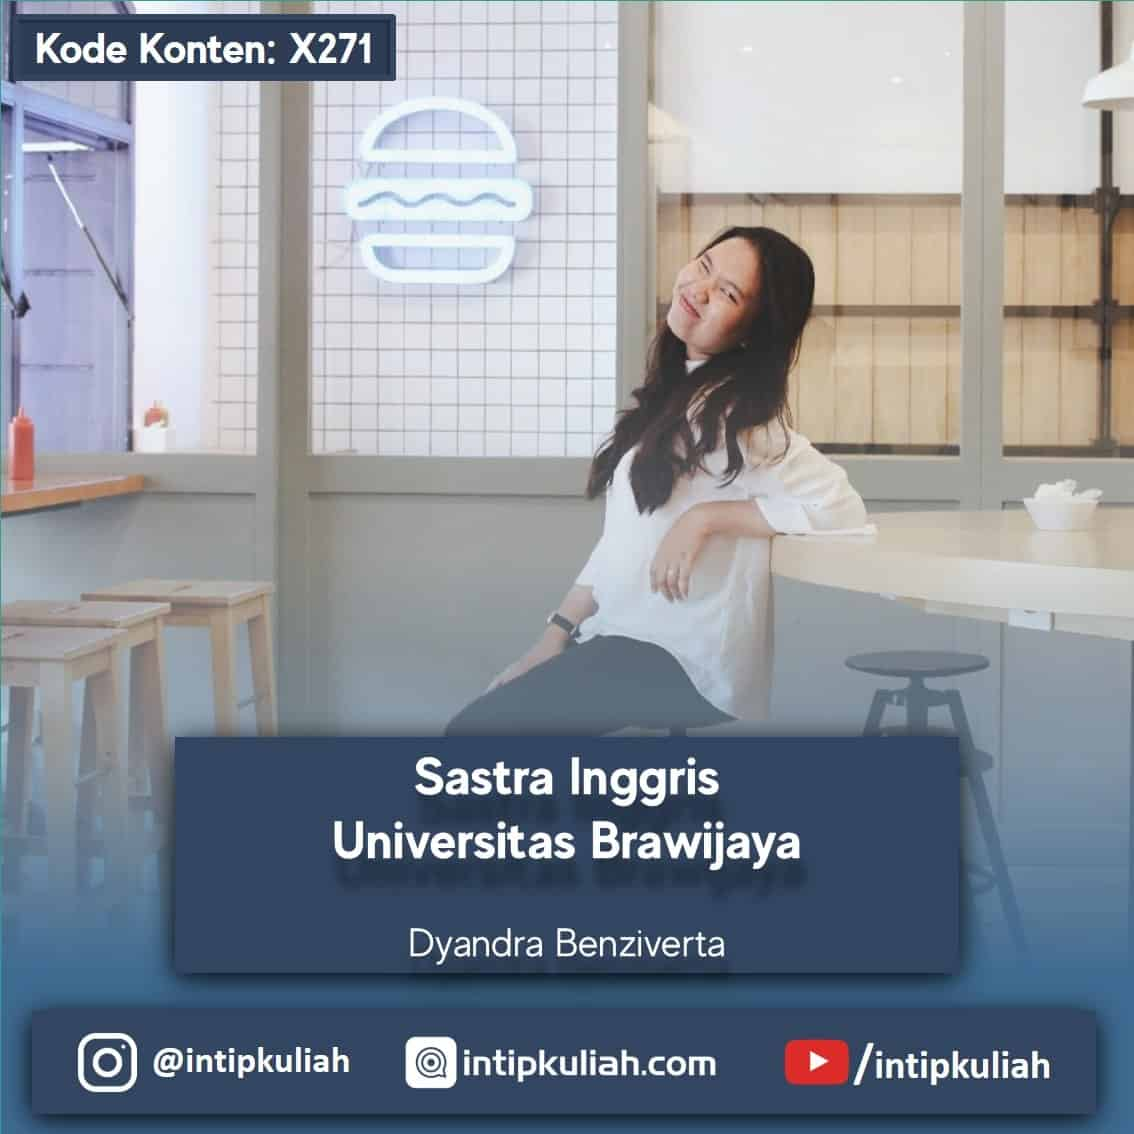 Sastra Inggris Universitas Brawijaya (Dyandra)